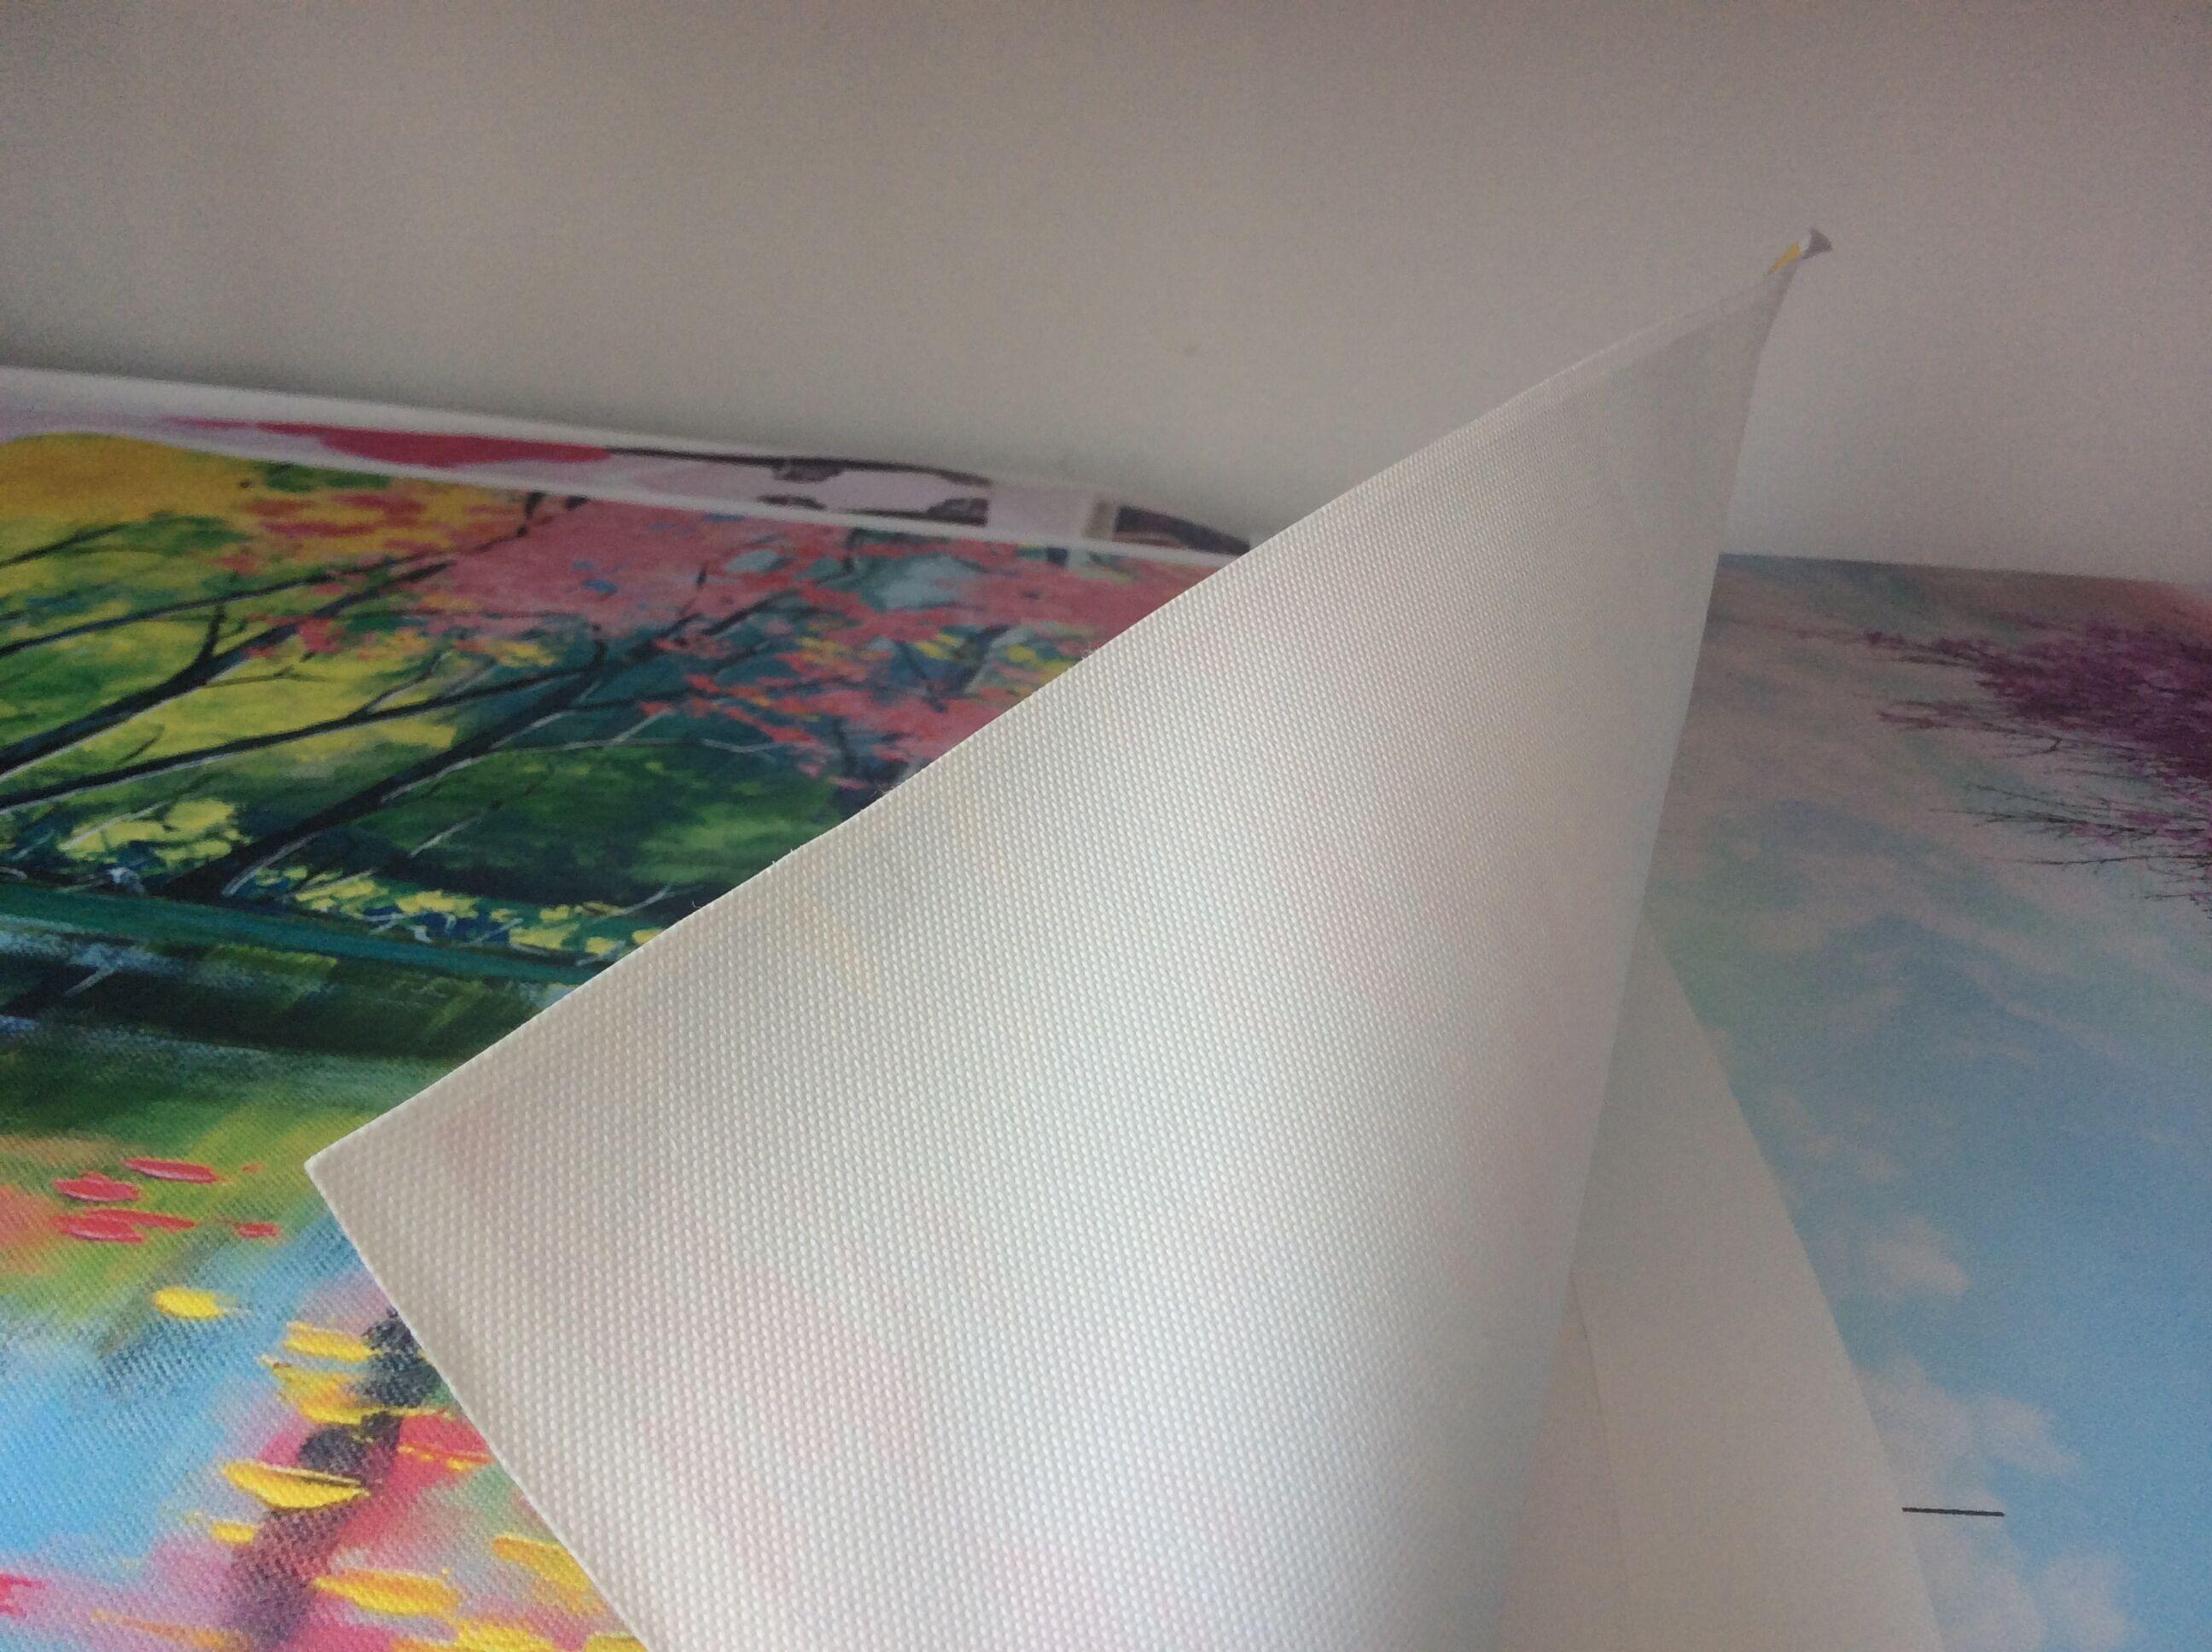 LARGE 5Panels Music Drum Print Purple Concert Giclee Canvas Prints Home Decor interior No Frame